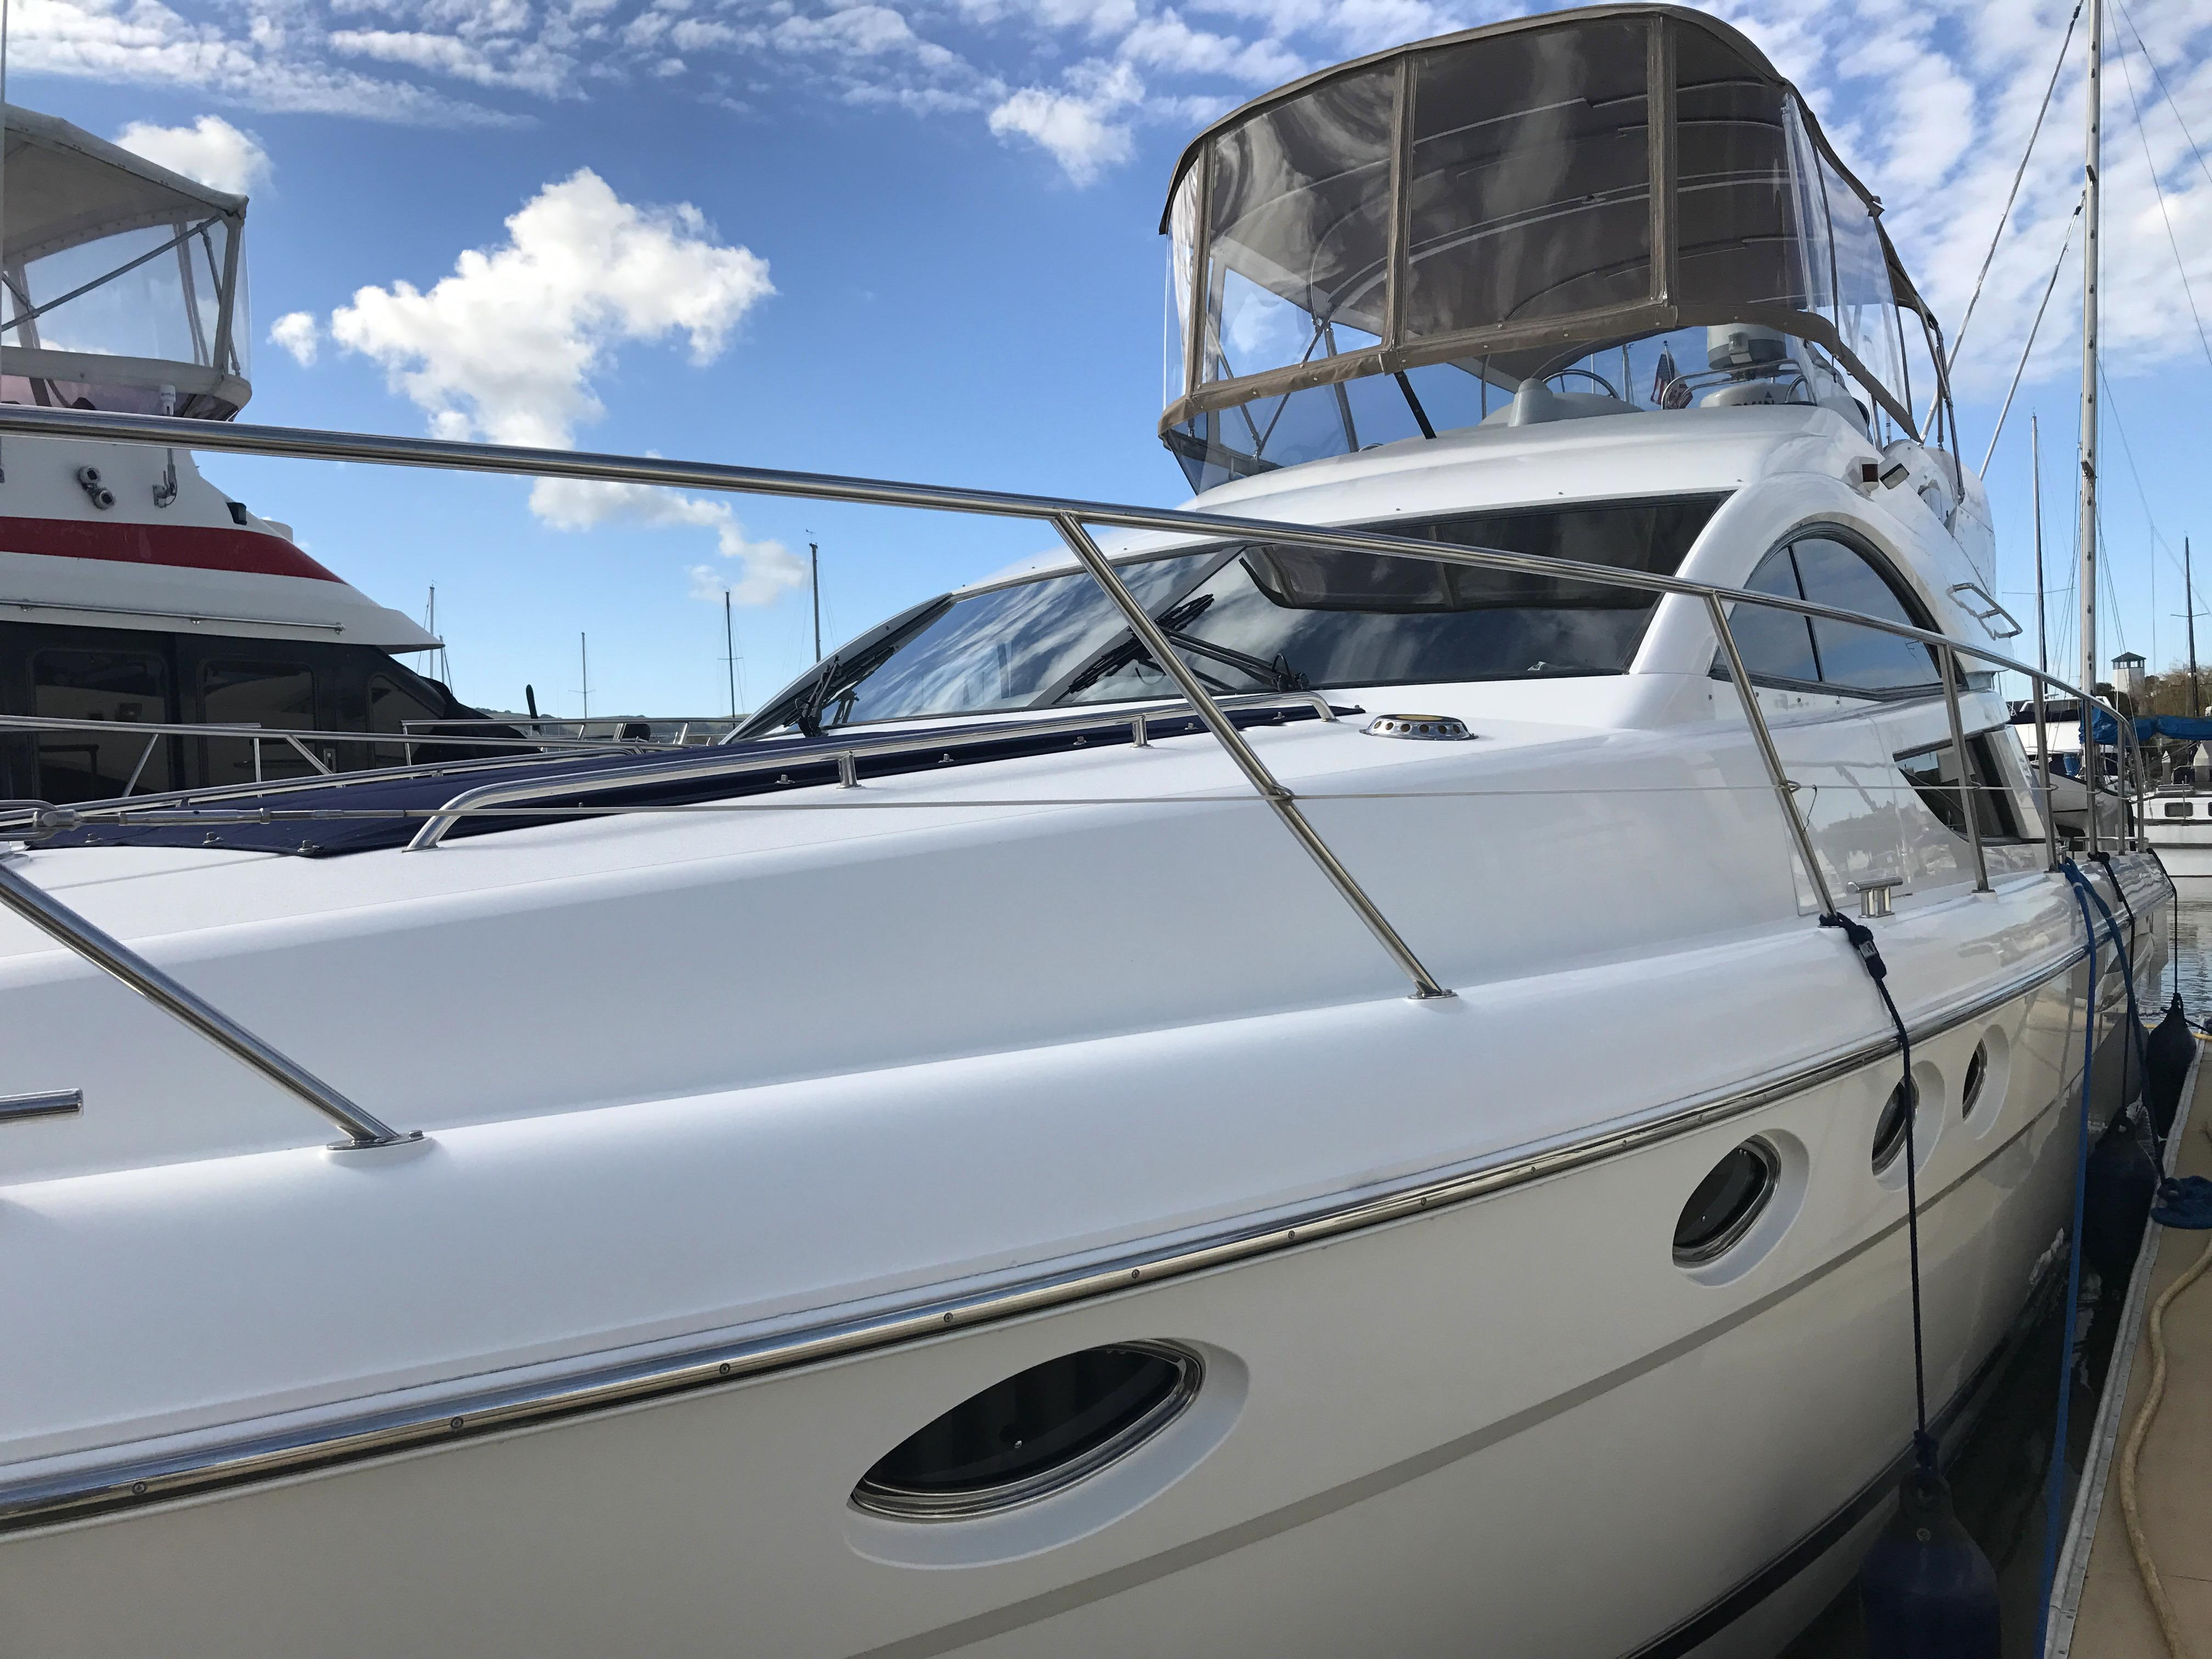 Used new fairline phantom 46 luxury motor yacht buy for Luxury motor yachts for sale